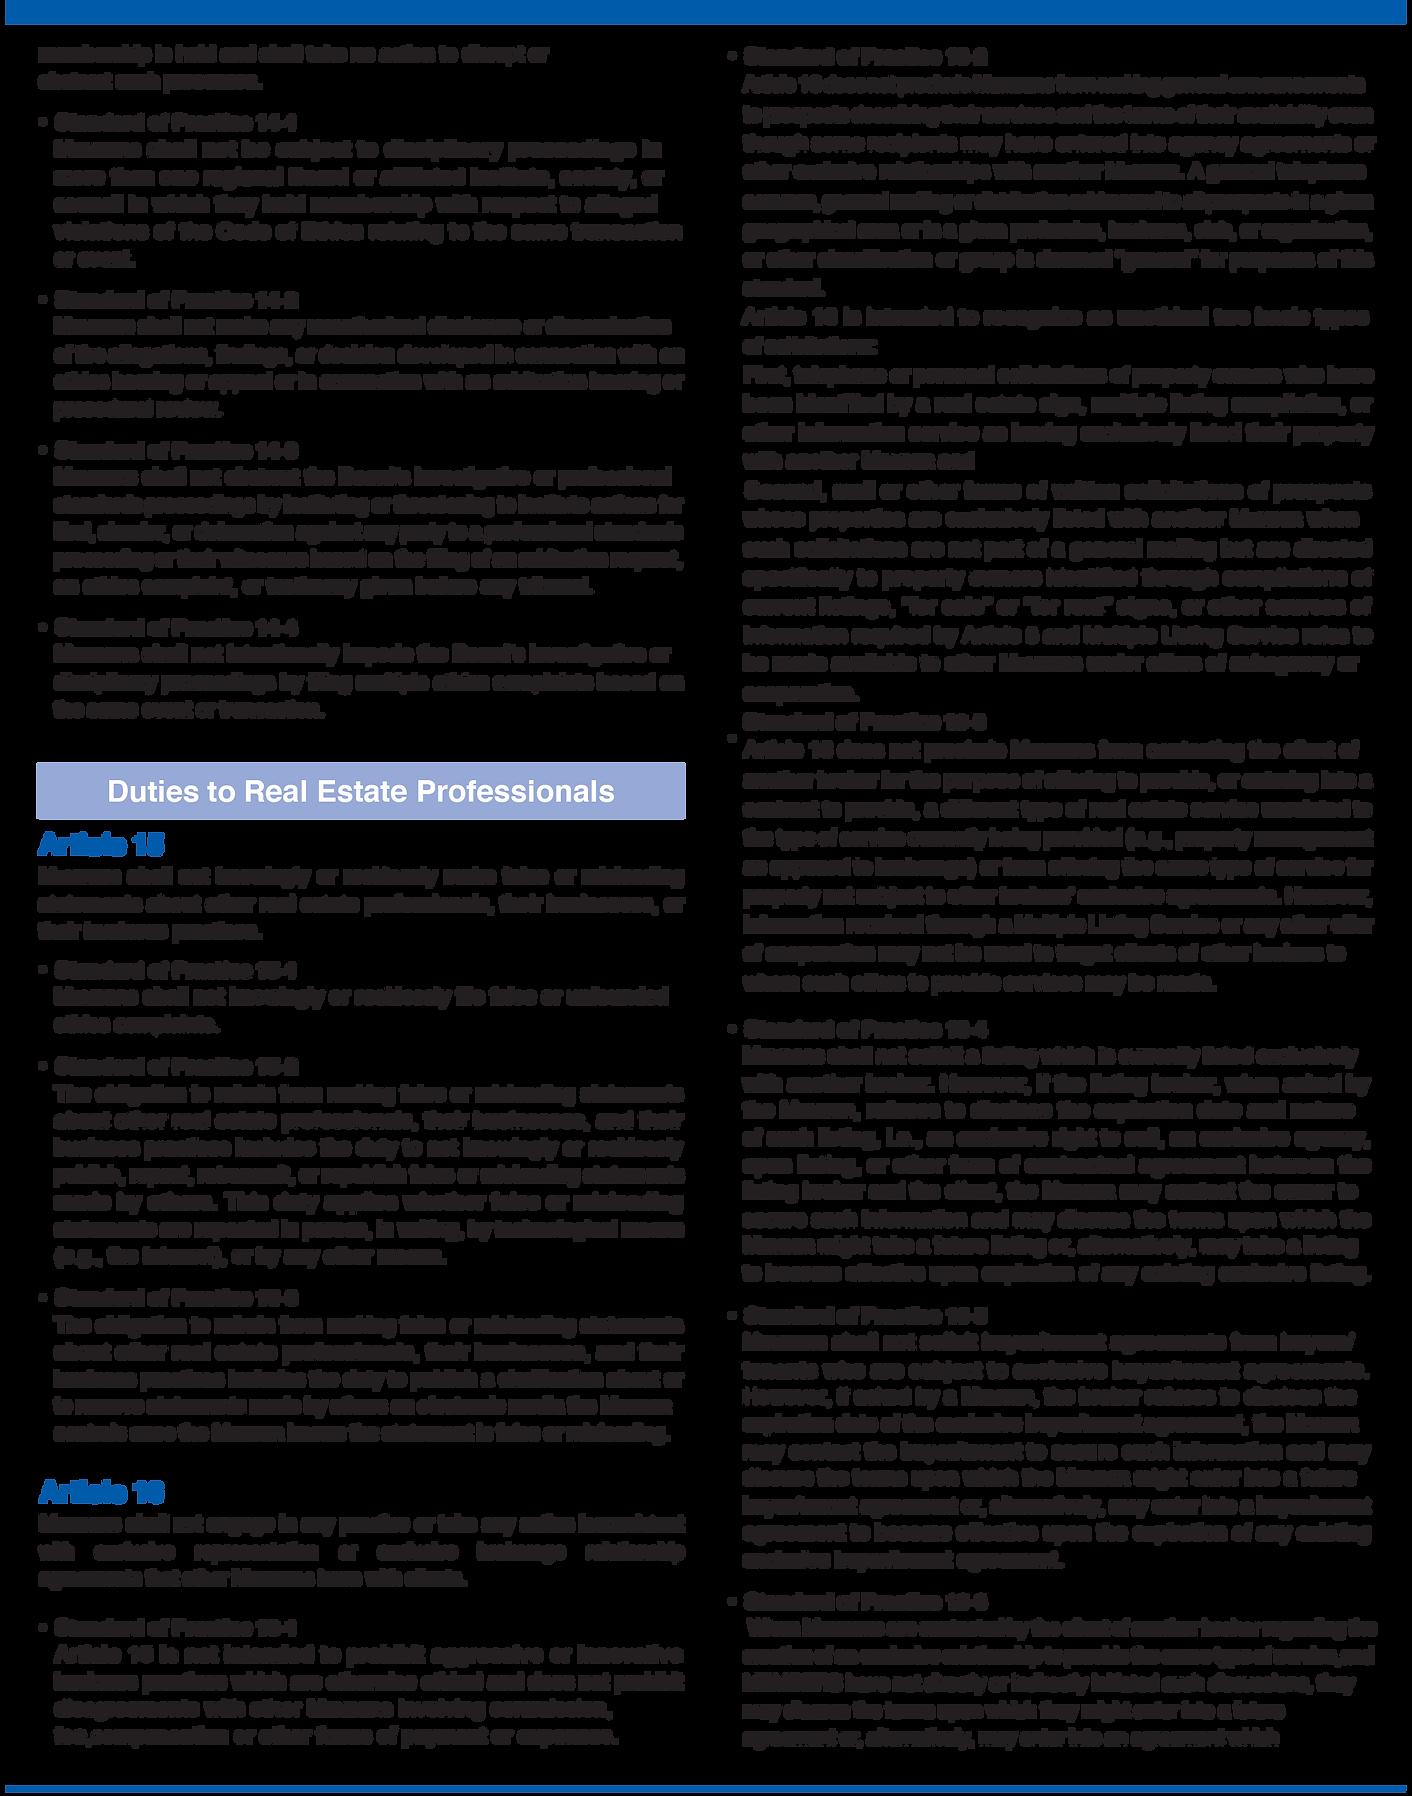 Code of Ethics BNAR-6.png